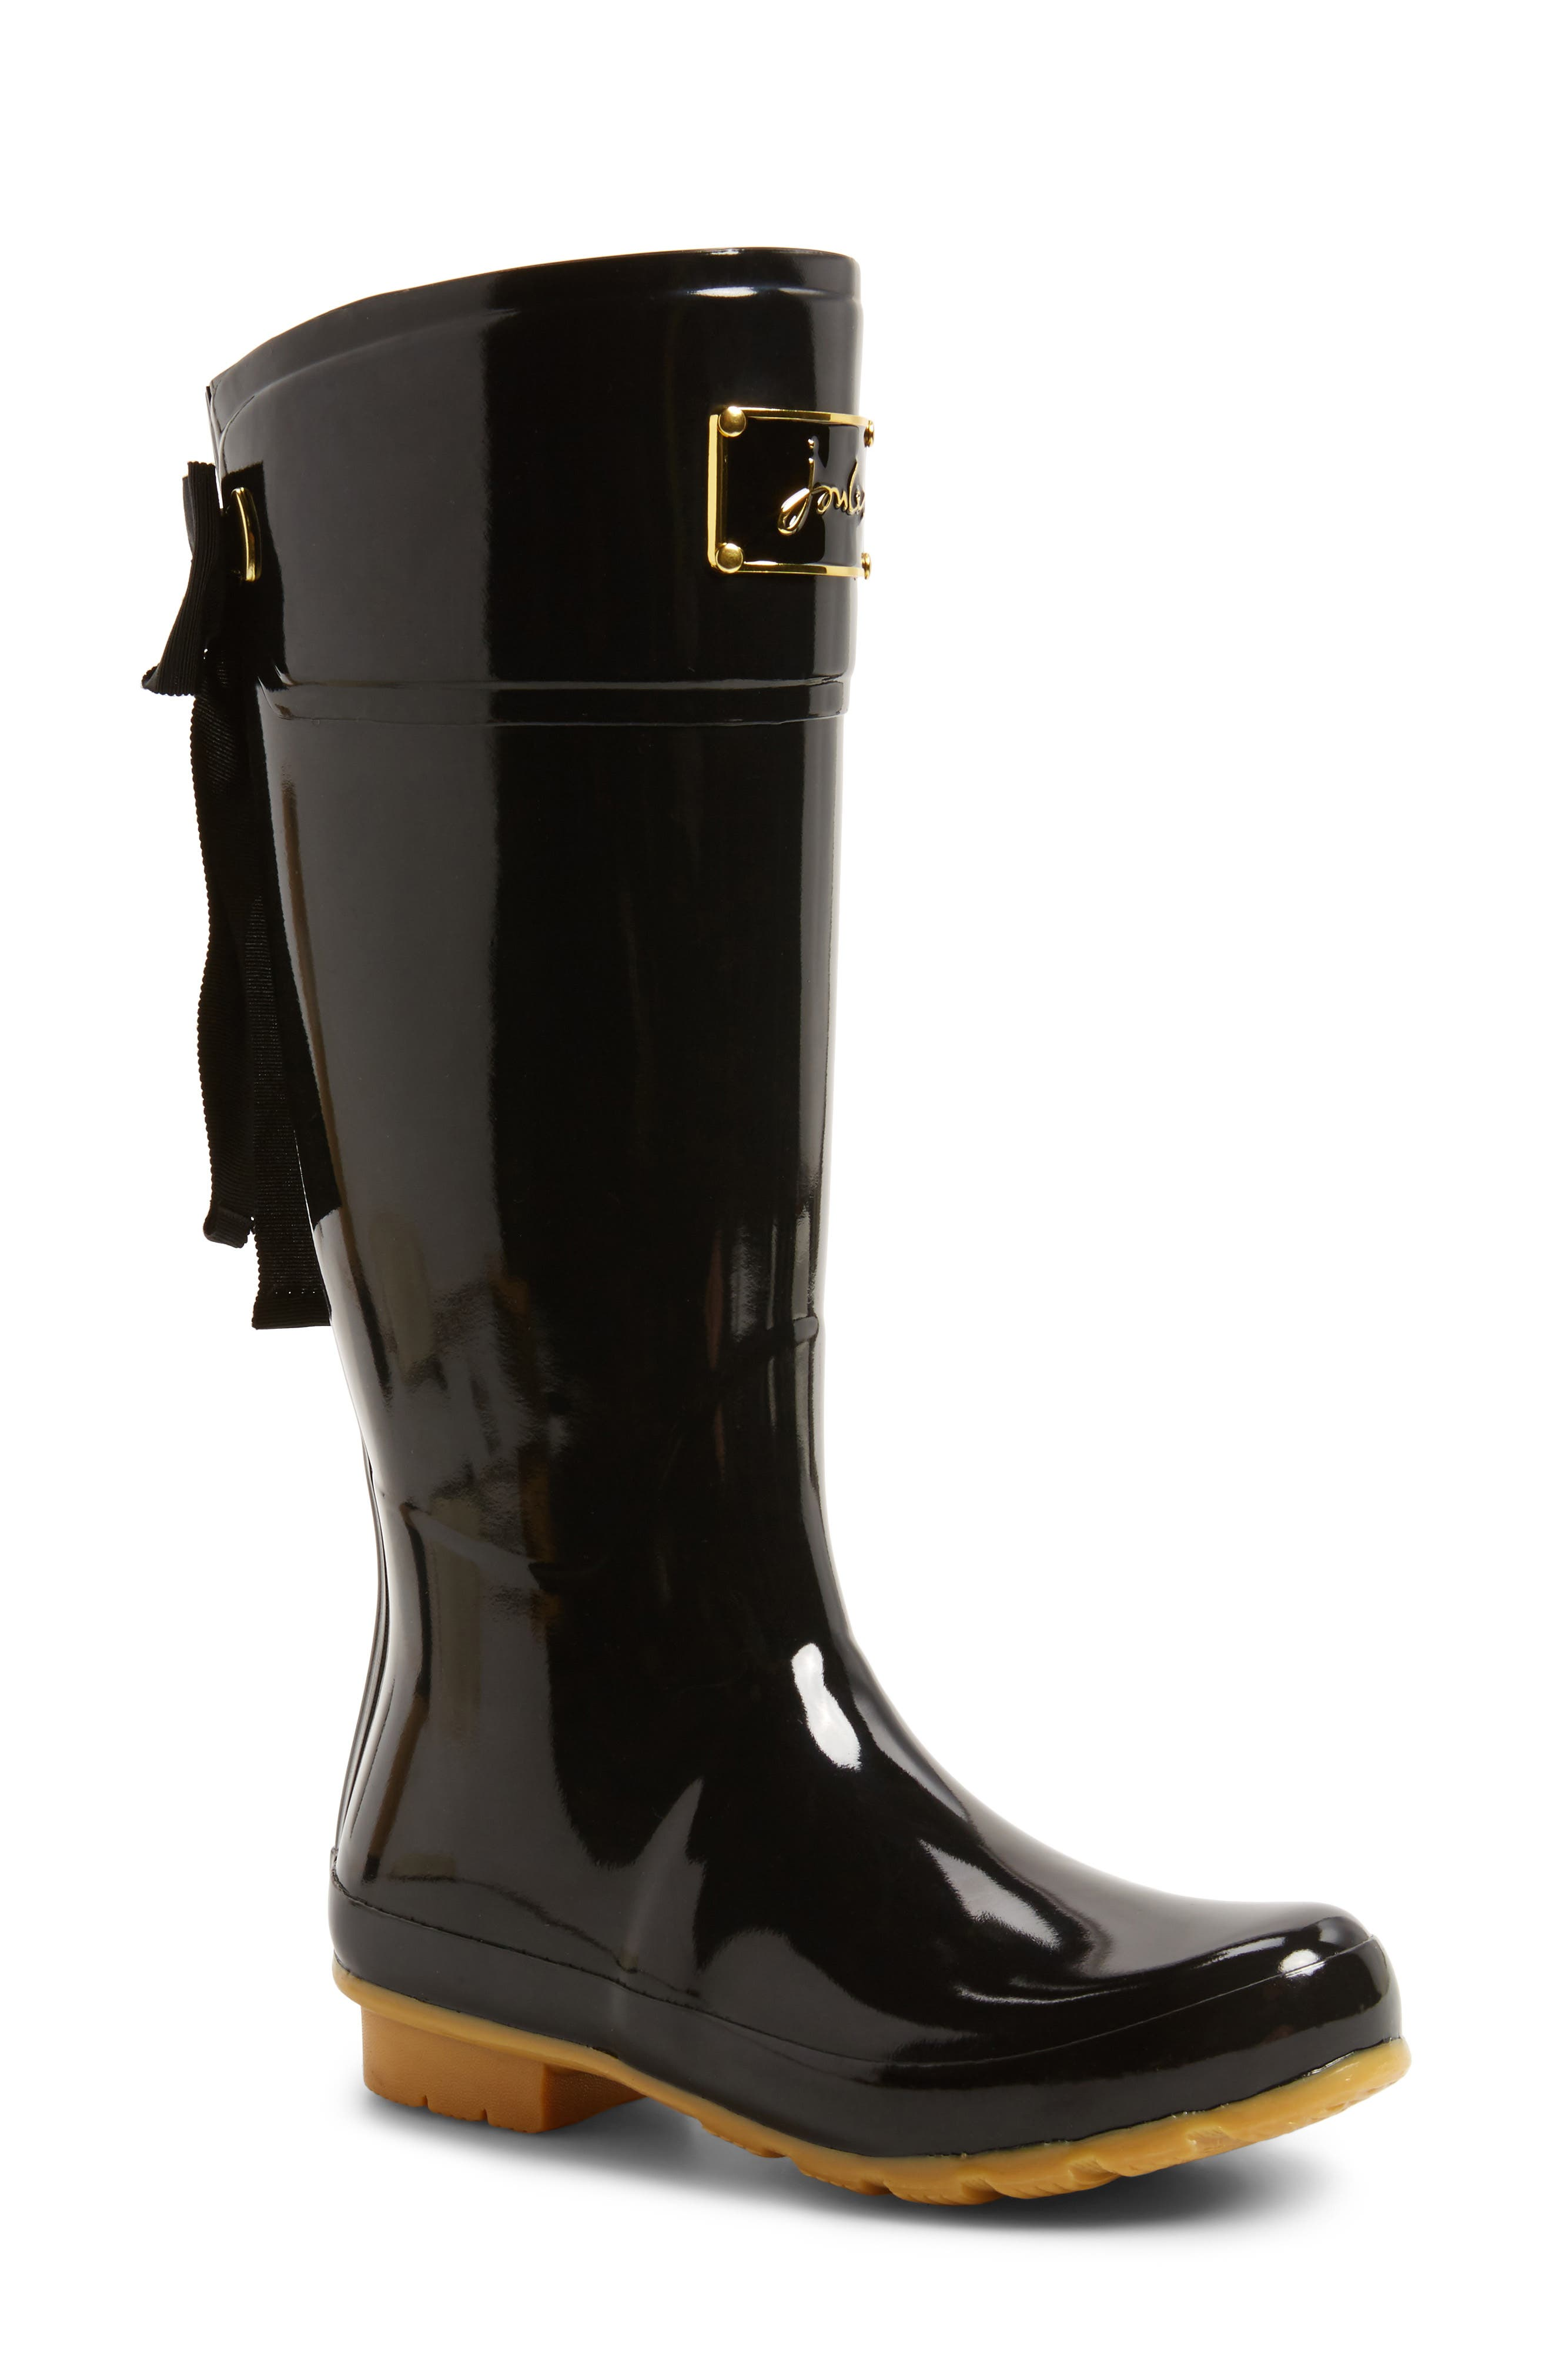 Alternate Image 1 Selected - Joules 'Evedon' Rain Boot (Women)